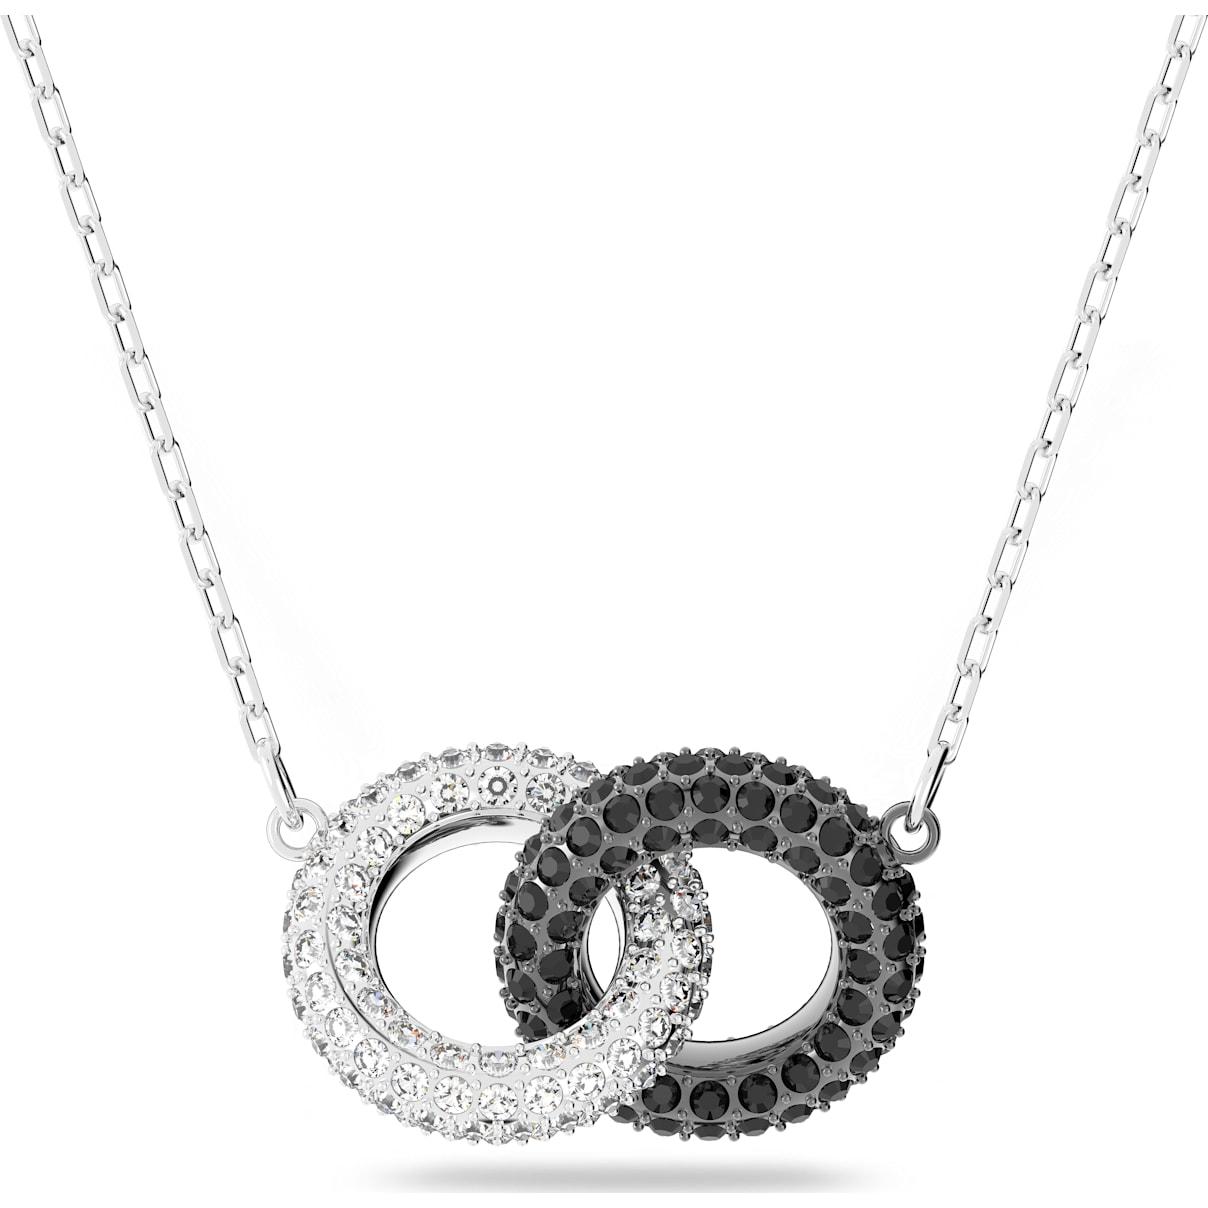 Swarovski Stone Necklace, Multi-colored, Rhodium plated